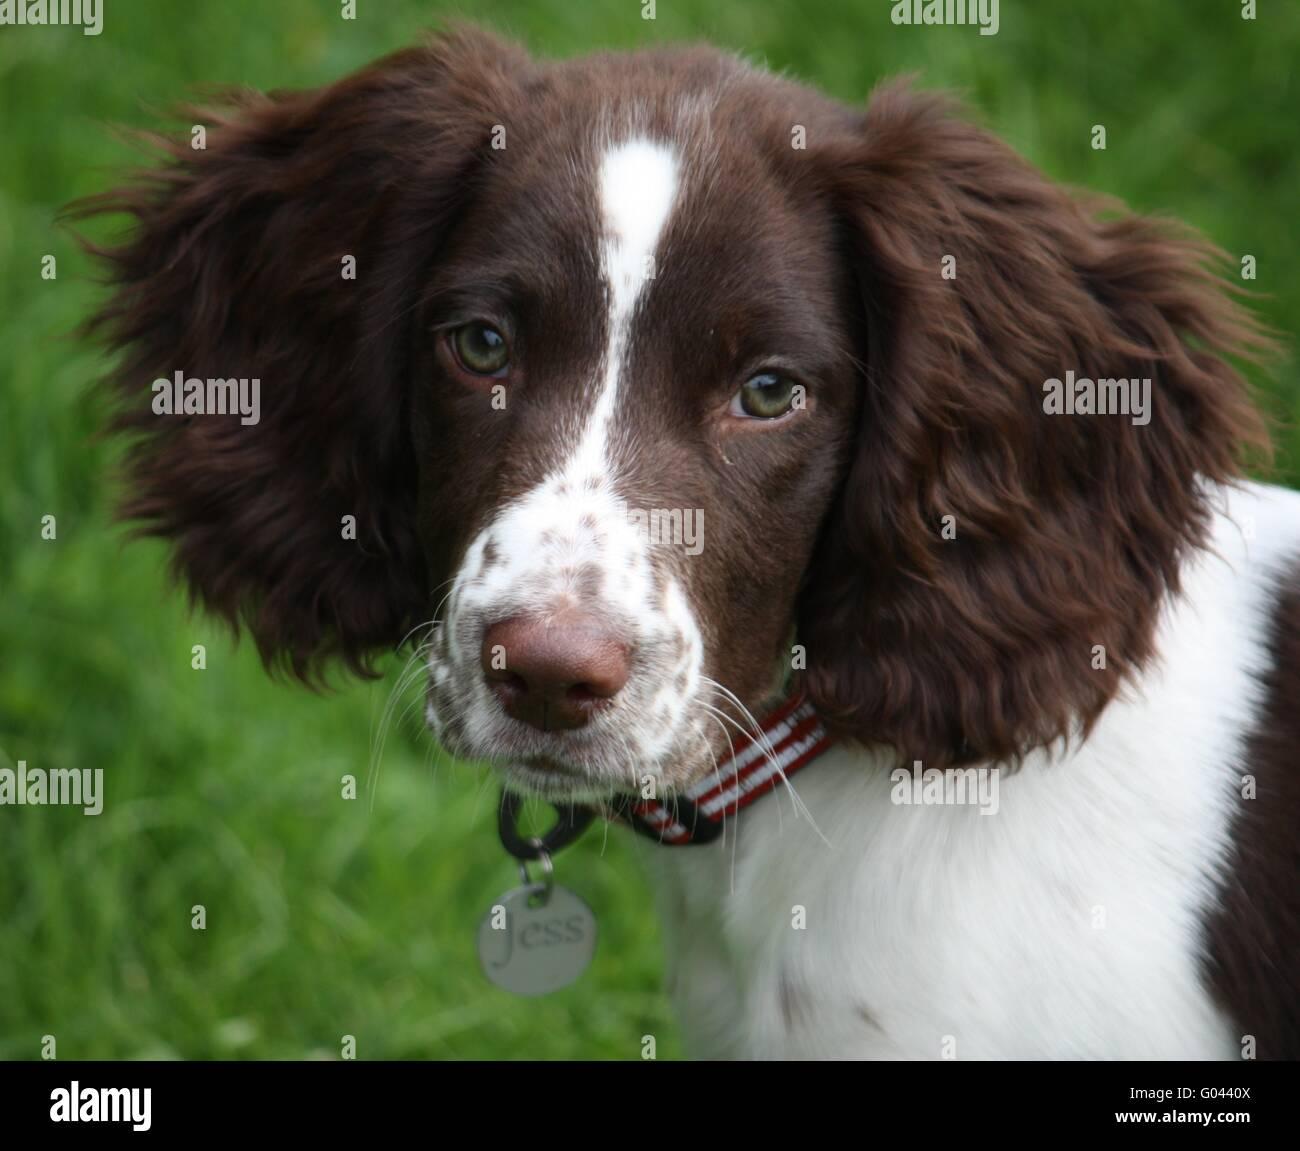 A Cute English Springer Spaniel Puppy Stock Photo Alamy